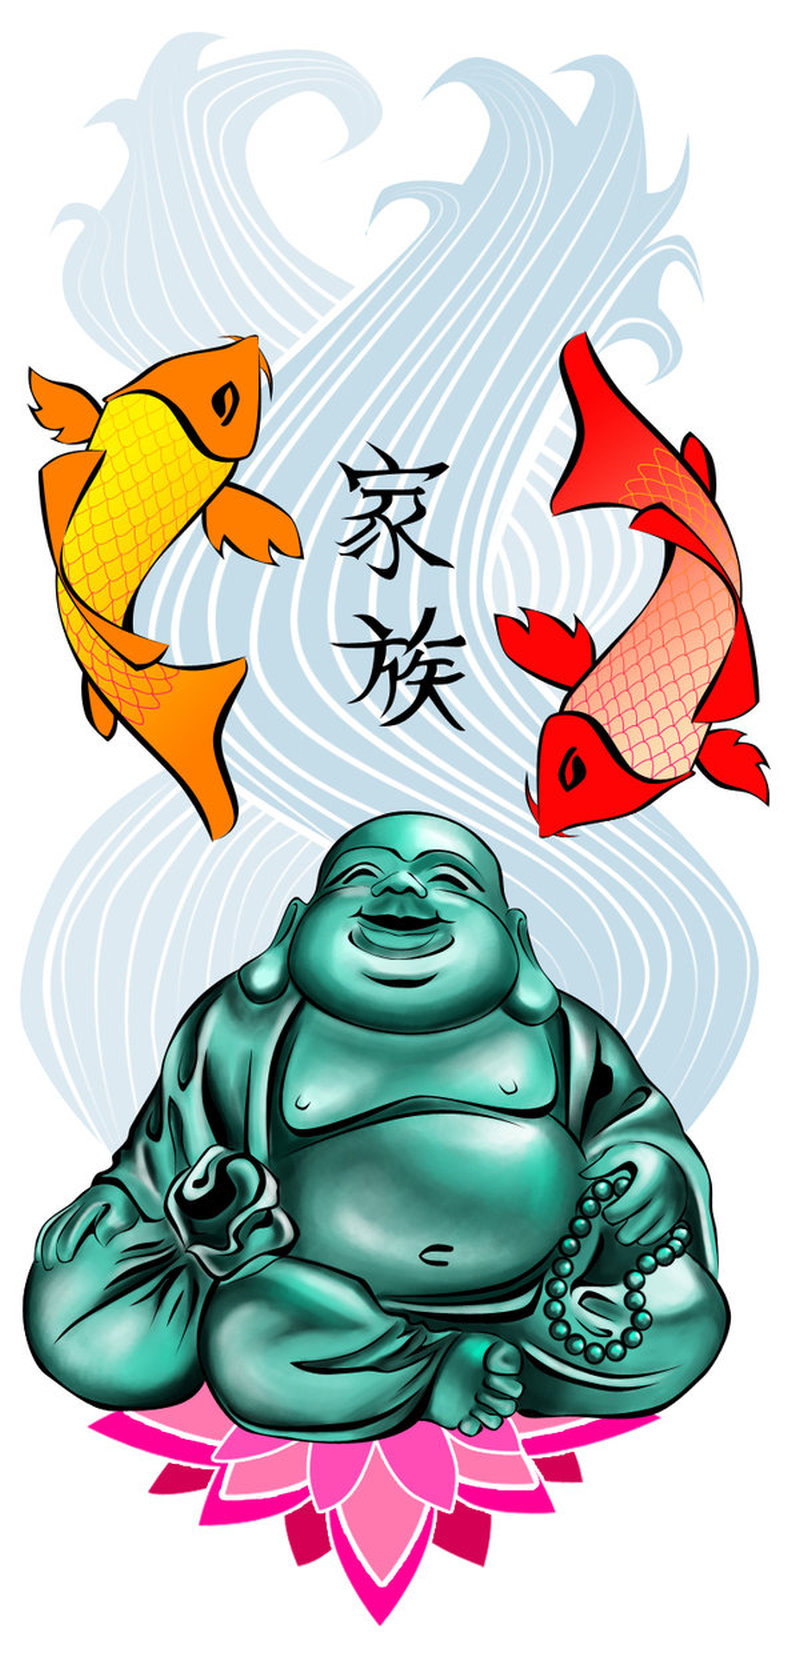 Elegant buddha fishes tattoo design